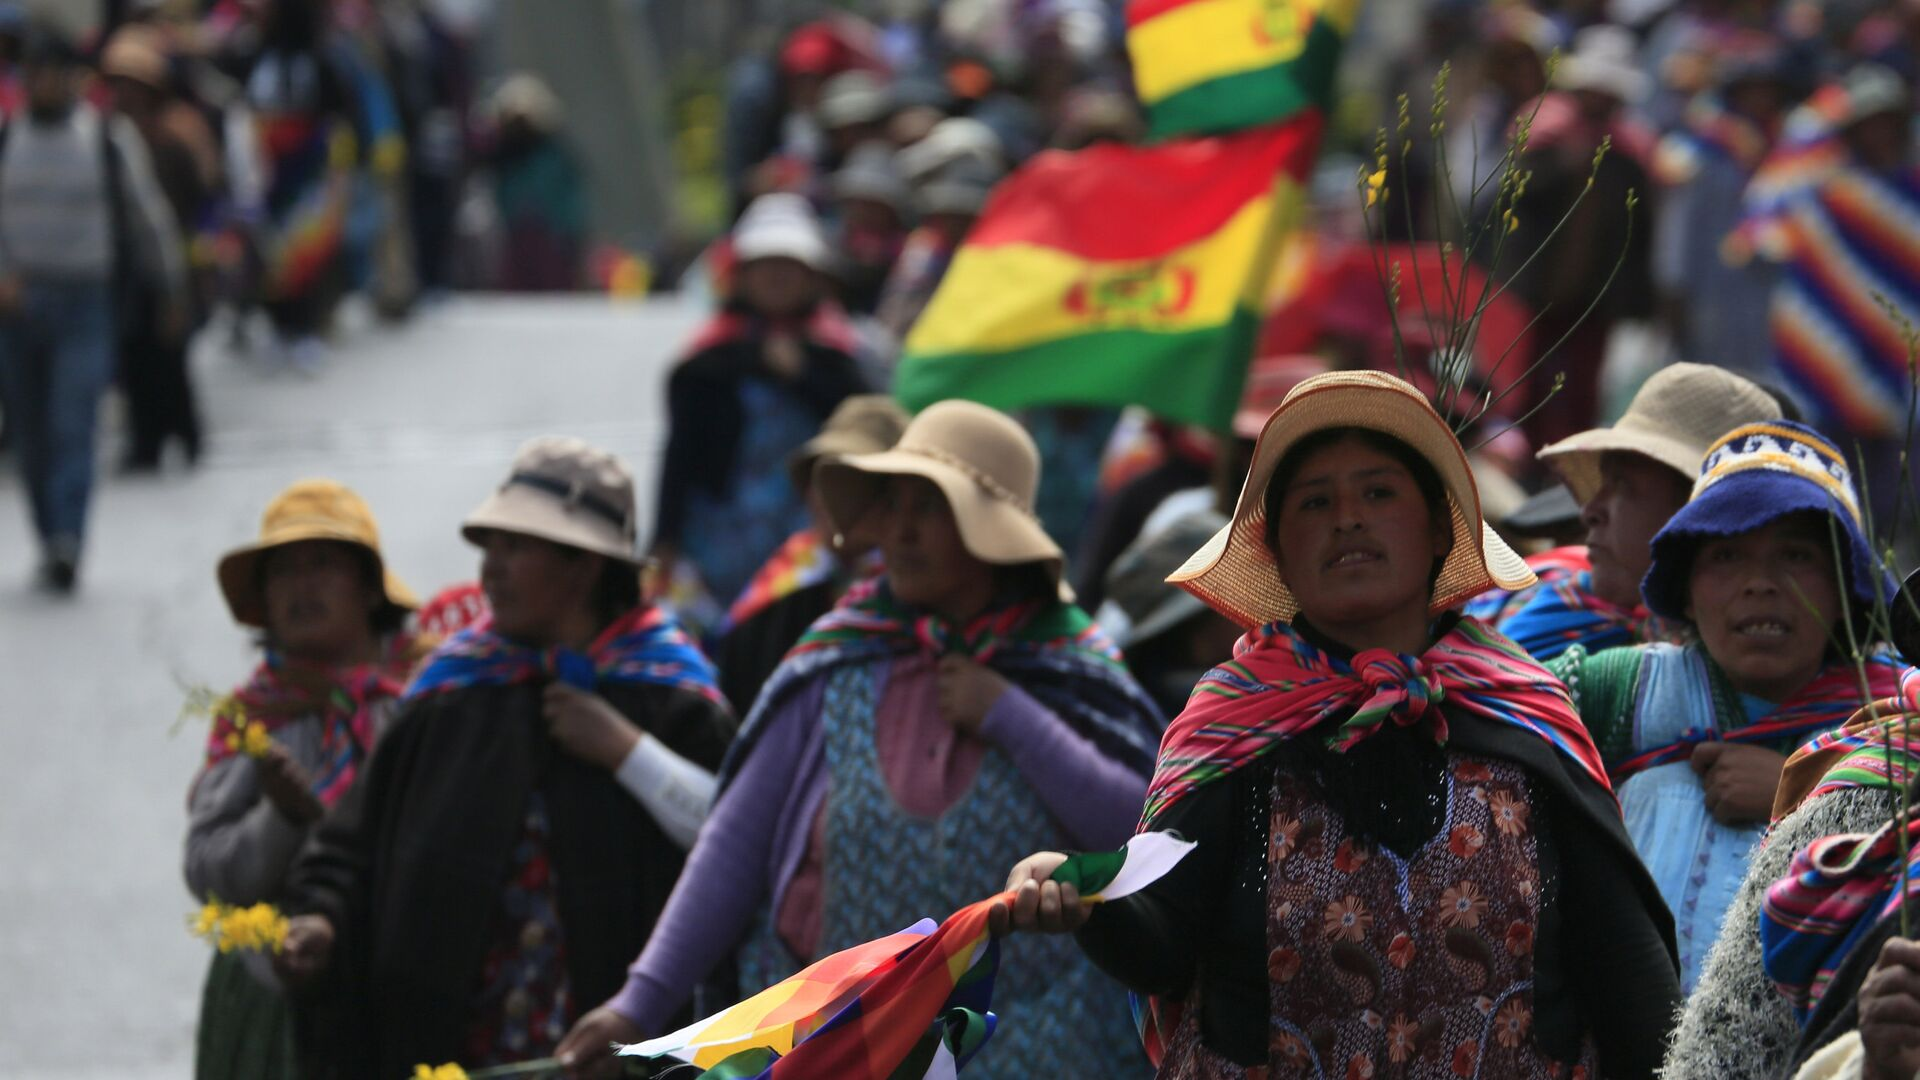 Mujeres indígenas en Bolivia - Sputnik Mundo, 1920, 30.09.2021